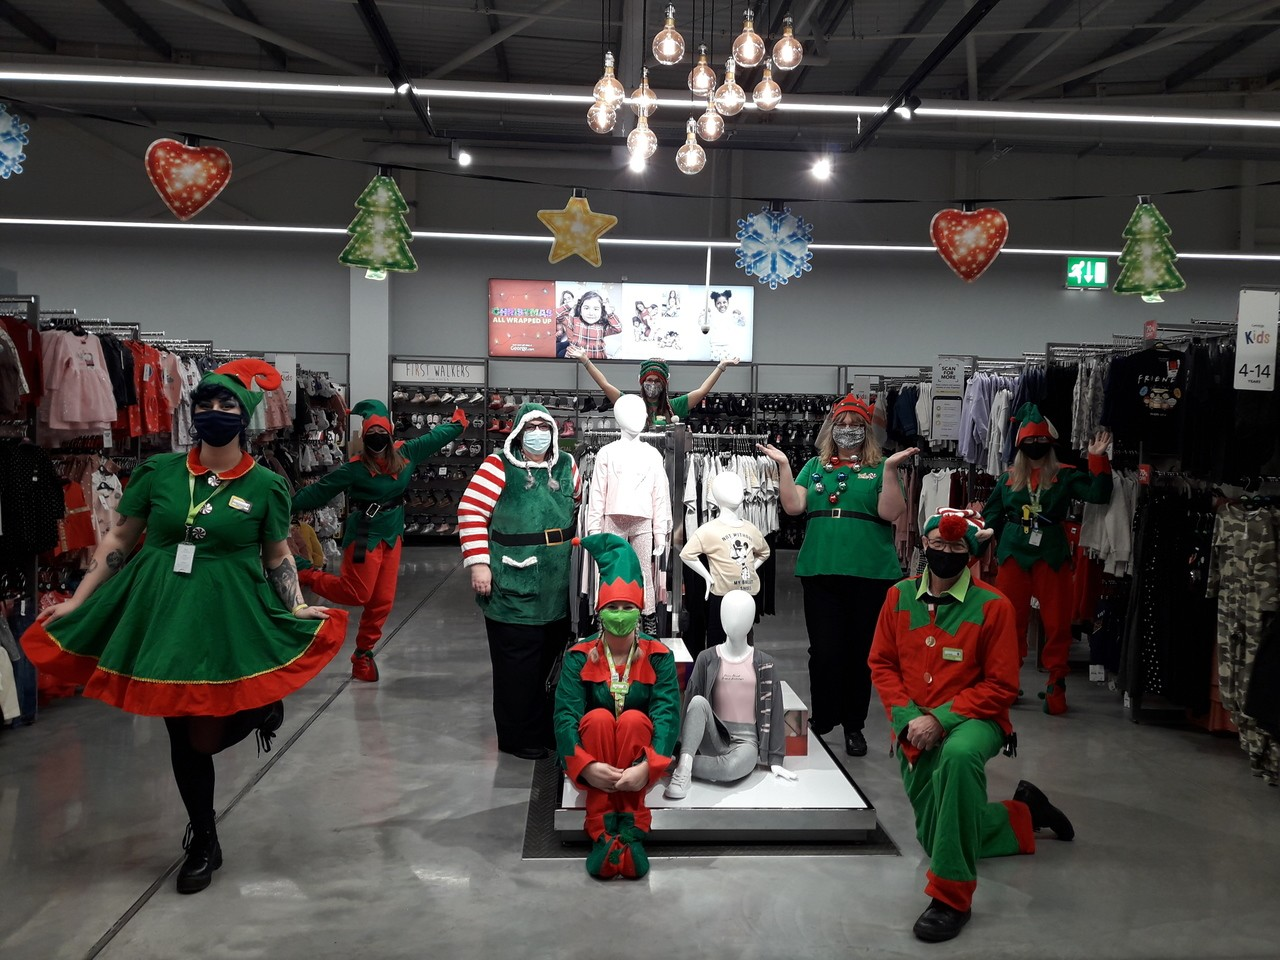 Festive elves invade Asda Barnstaple | Asda Barnstaple